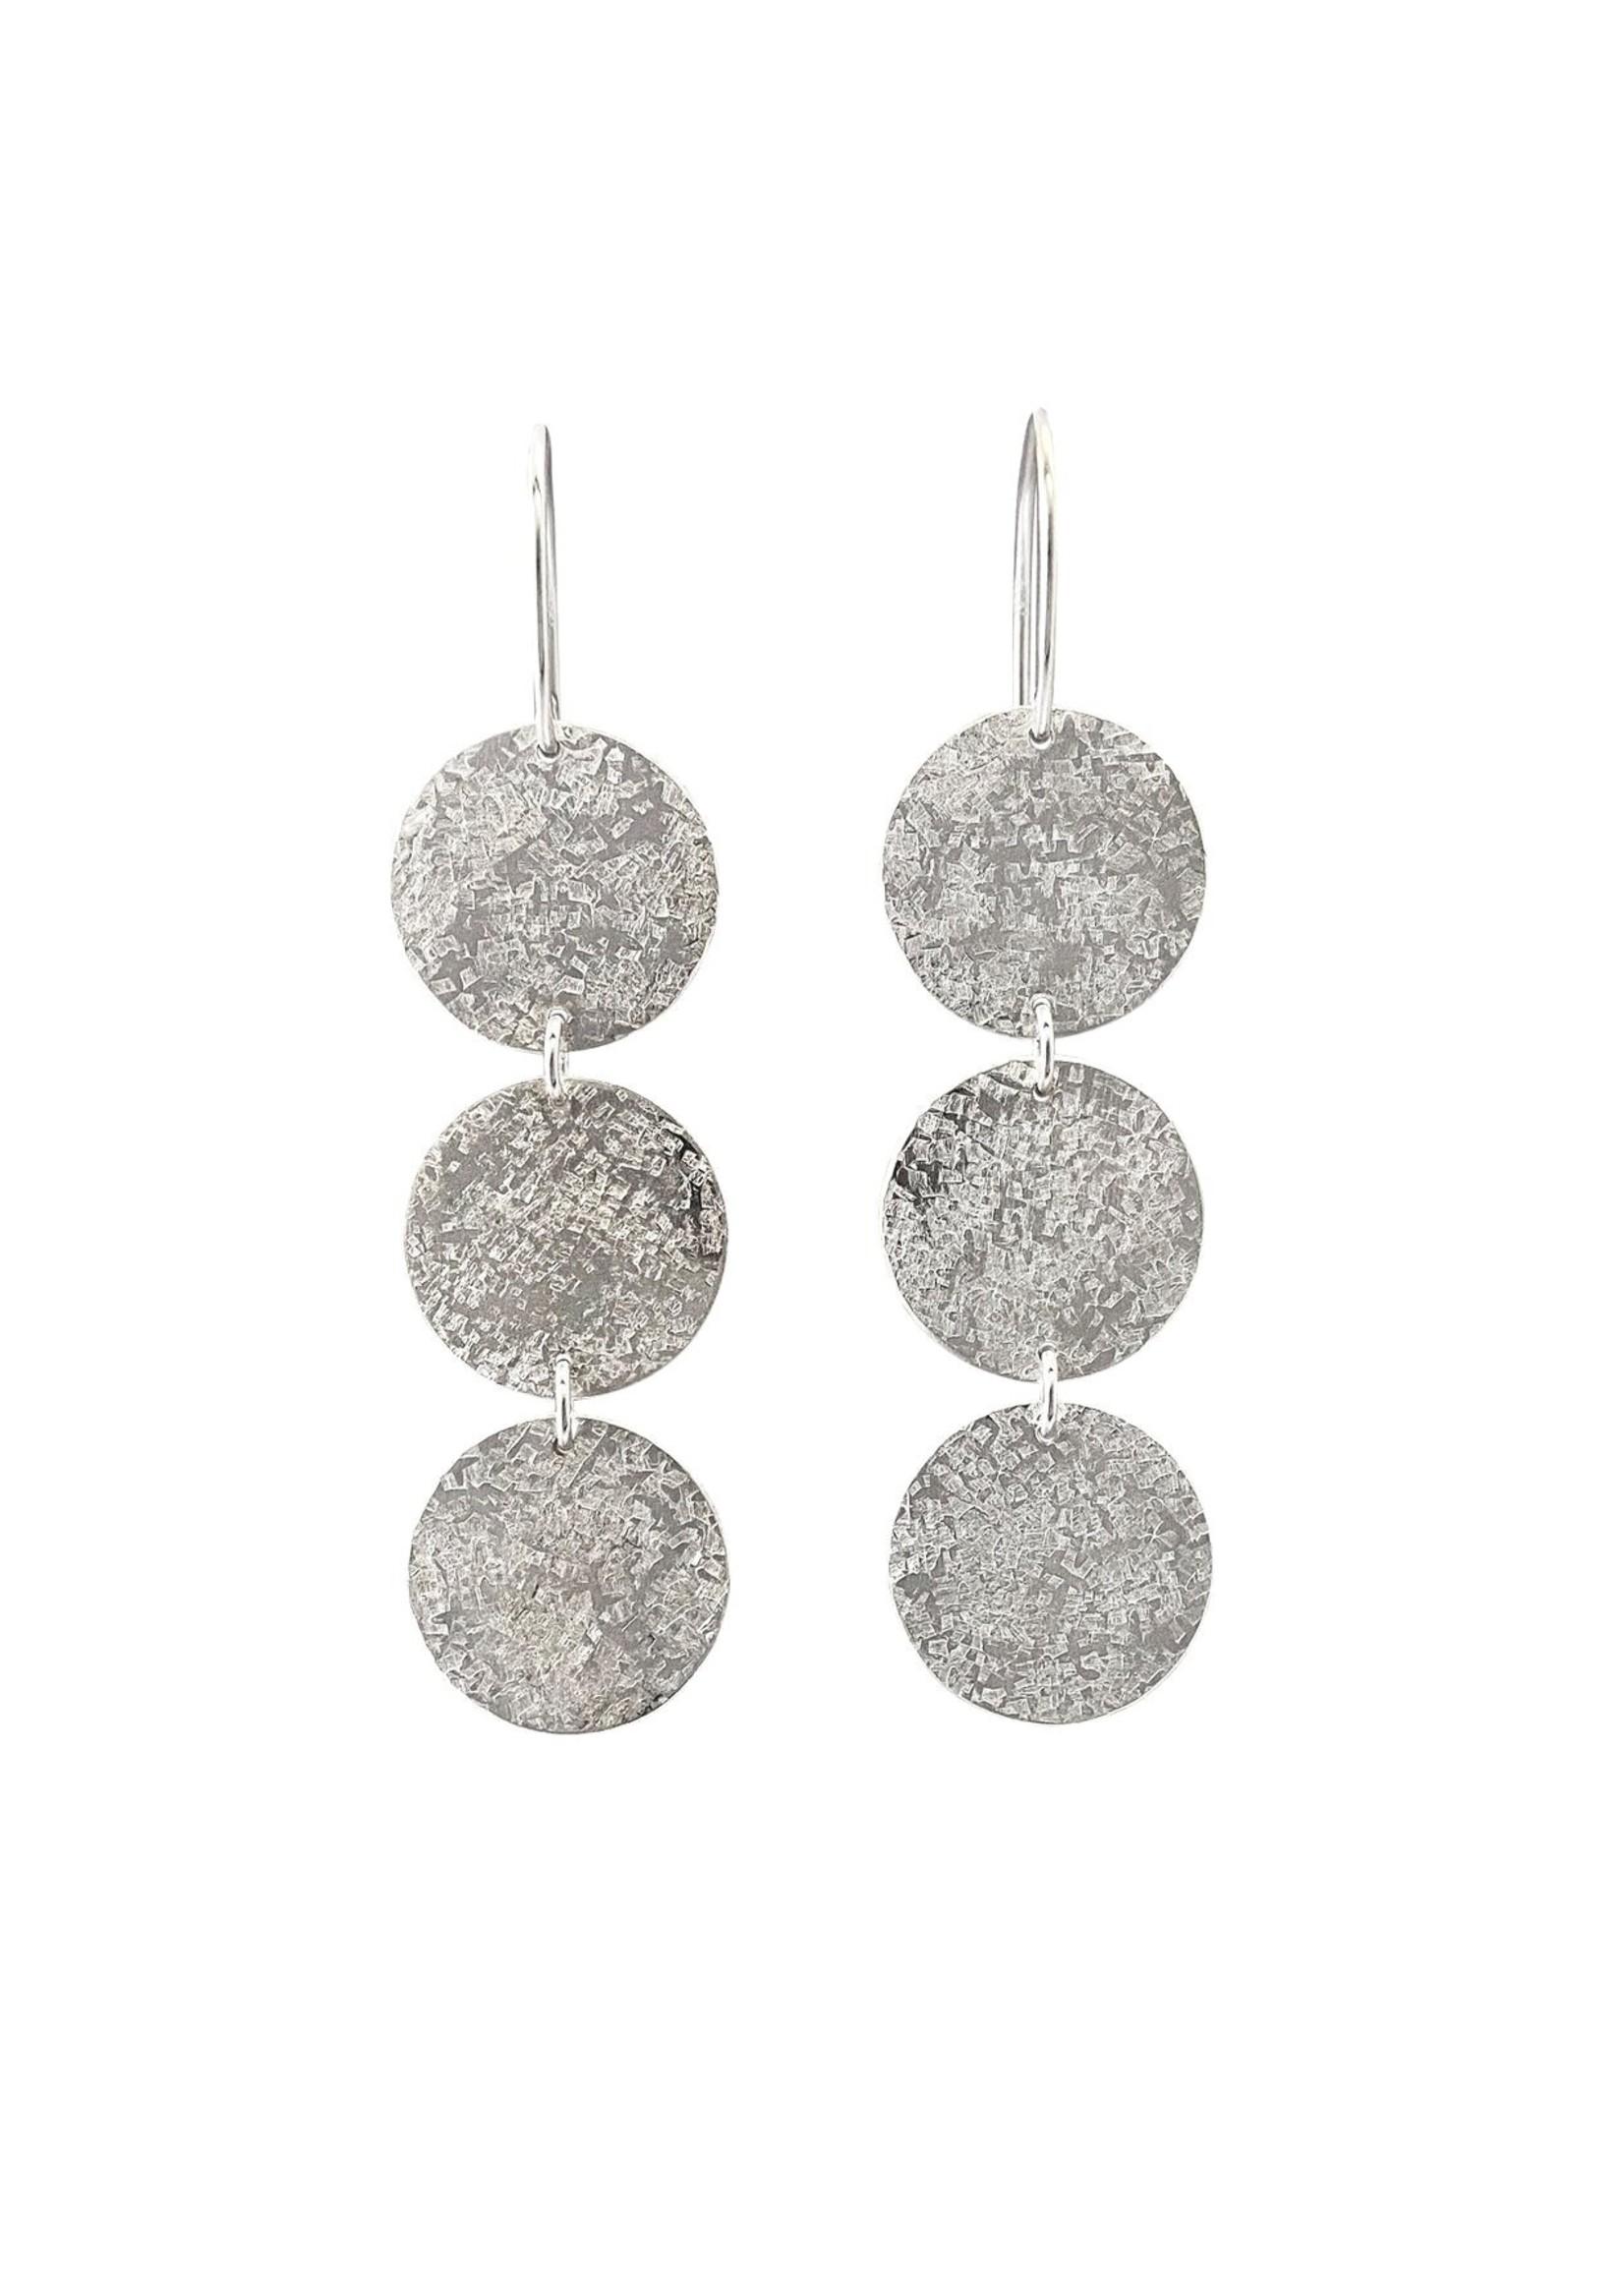 Suga Jewelry Snow Earrings